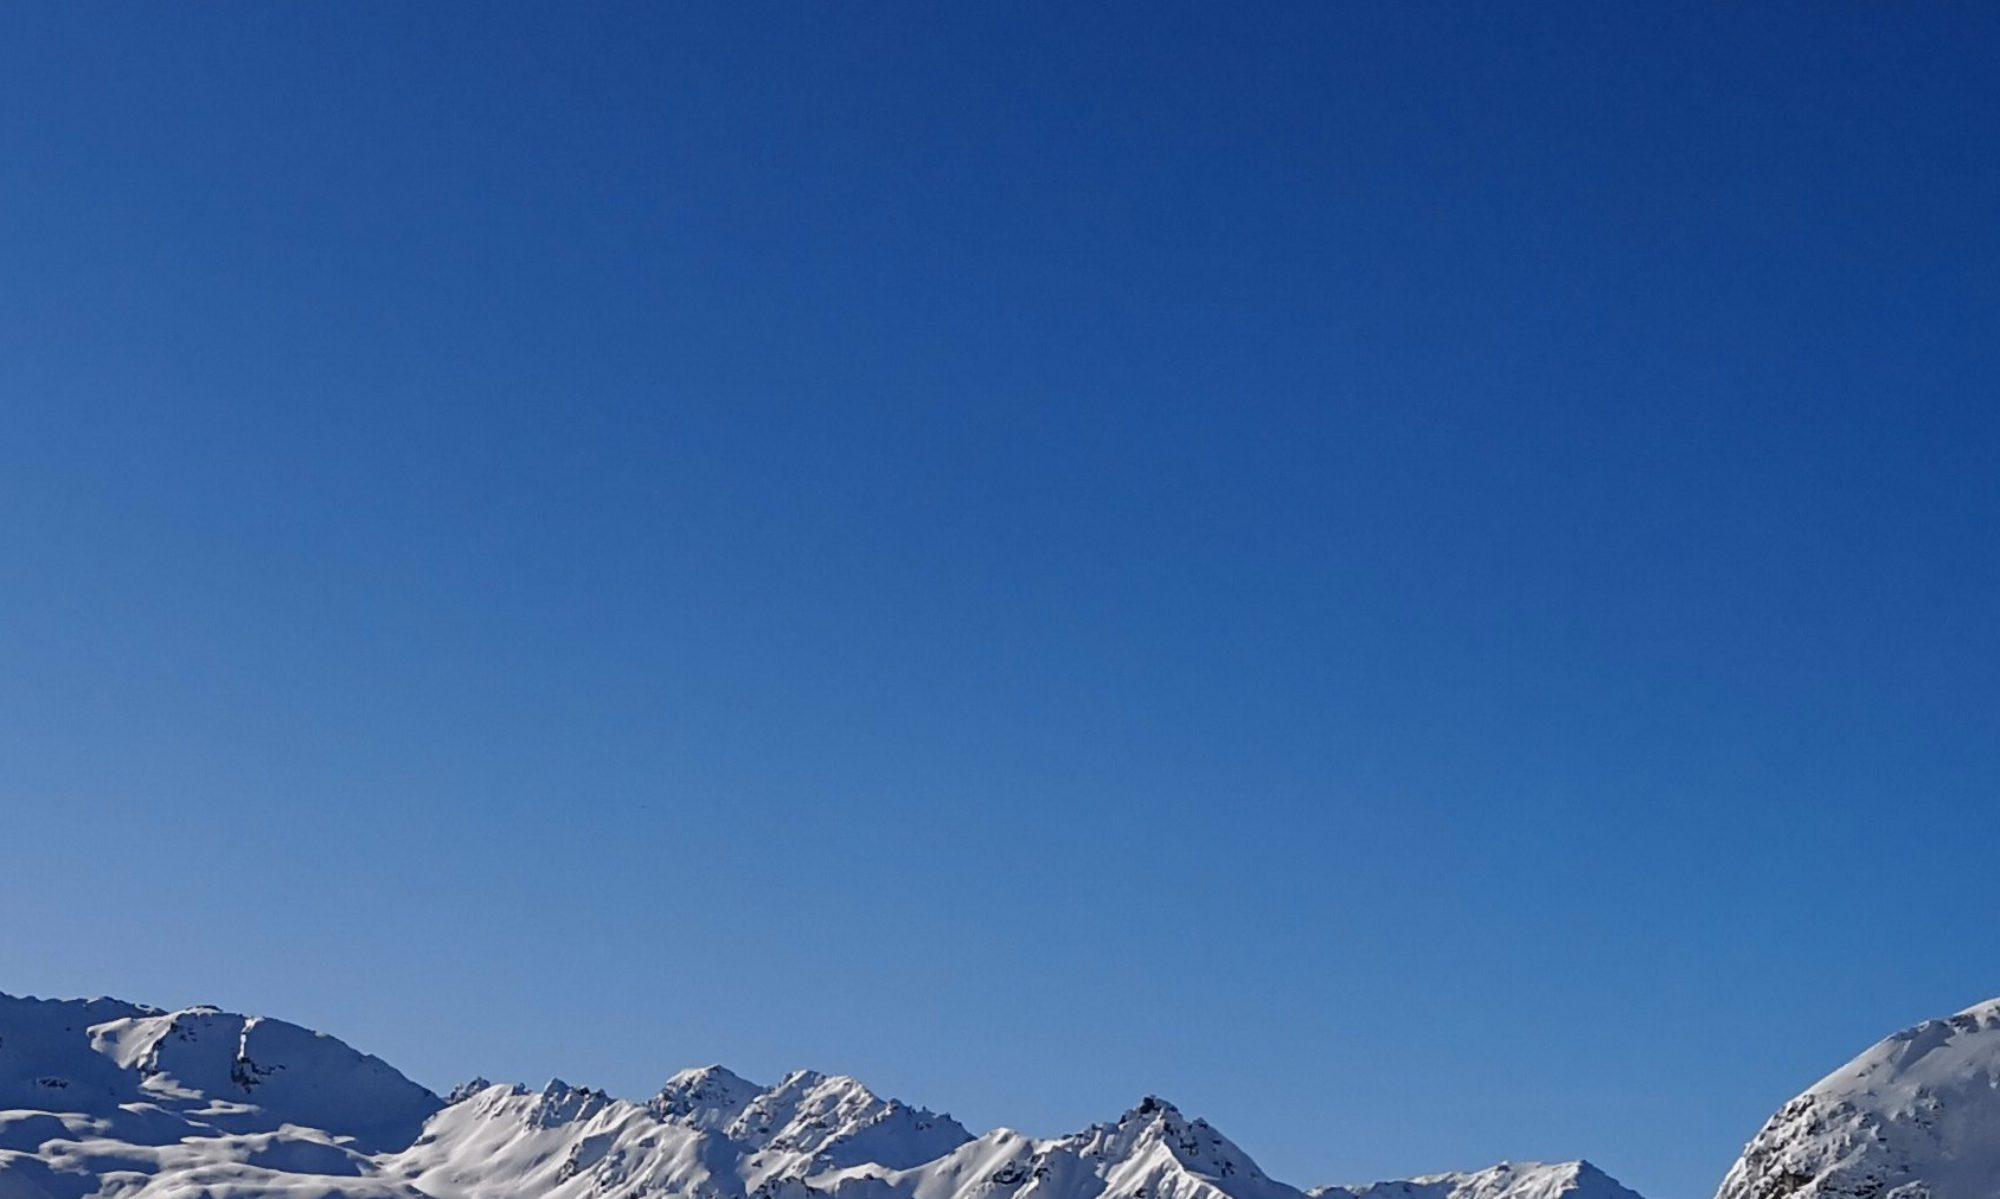 DSV Skischule des WSV Ebingen